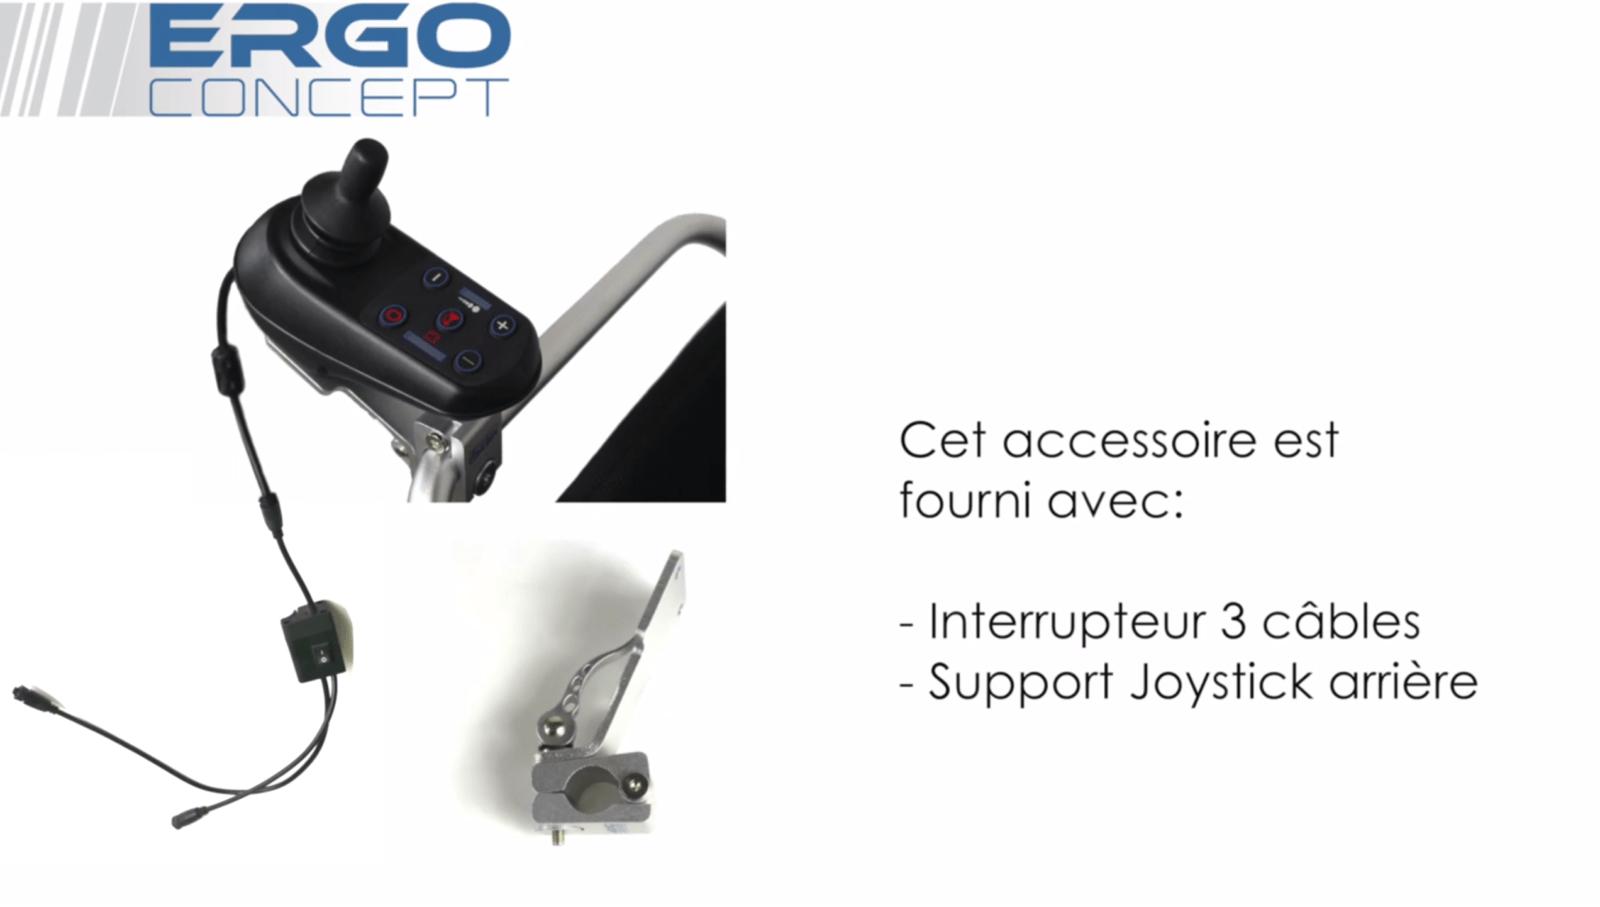 Interrupteur 3 câbles vidéo ergoconcept